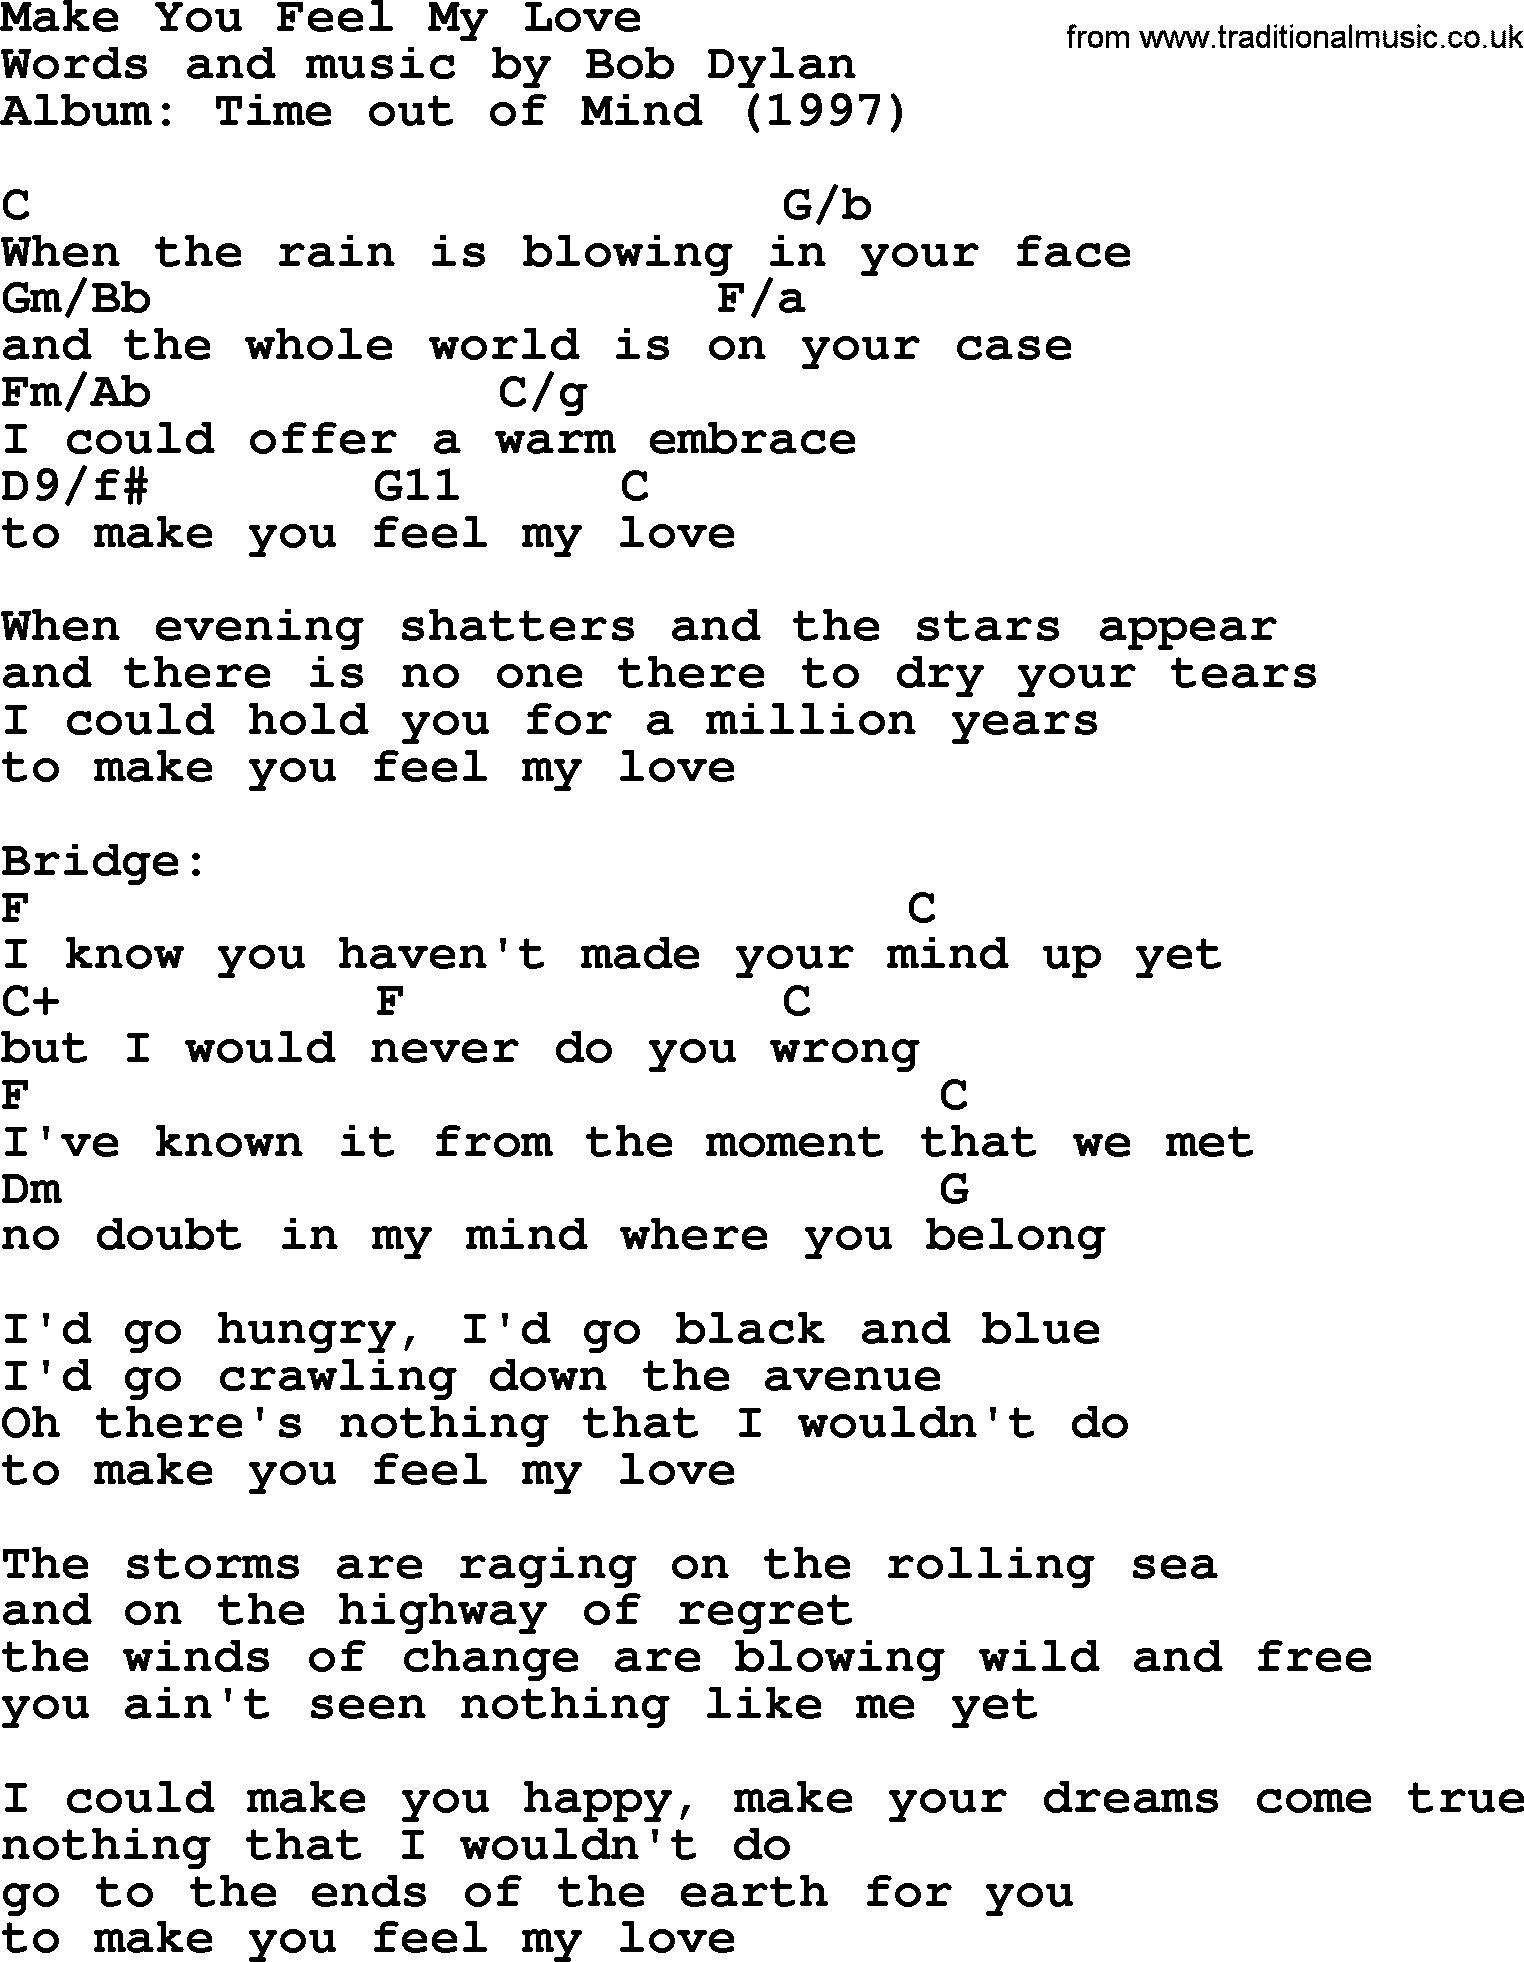 Bob Dylan Song Make You Feel My Love Lyrics And Chords